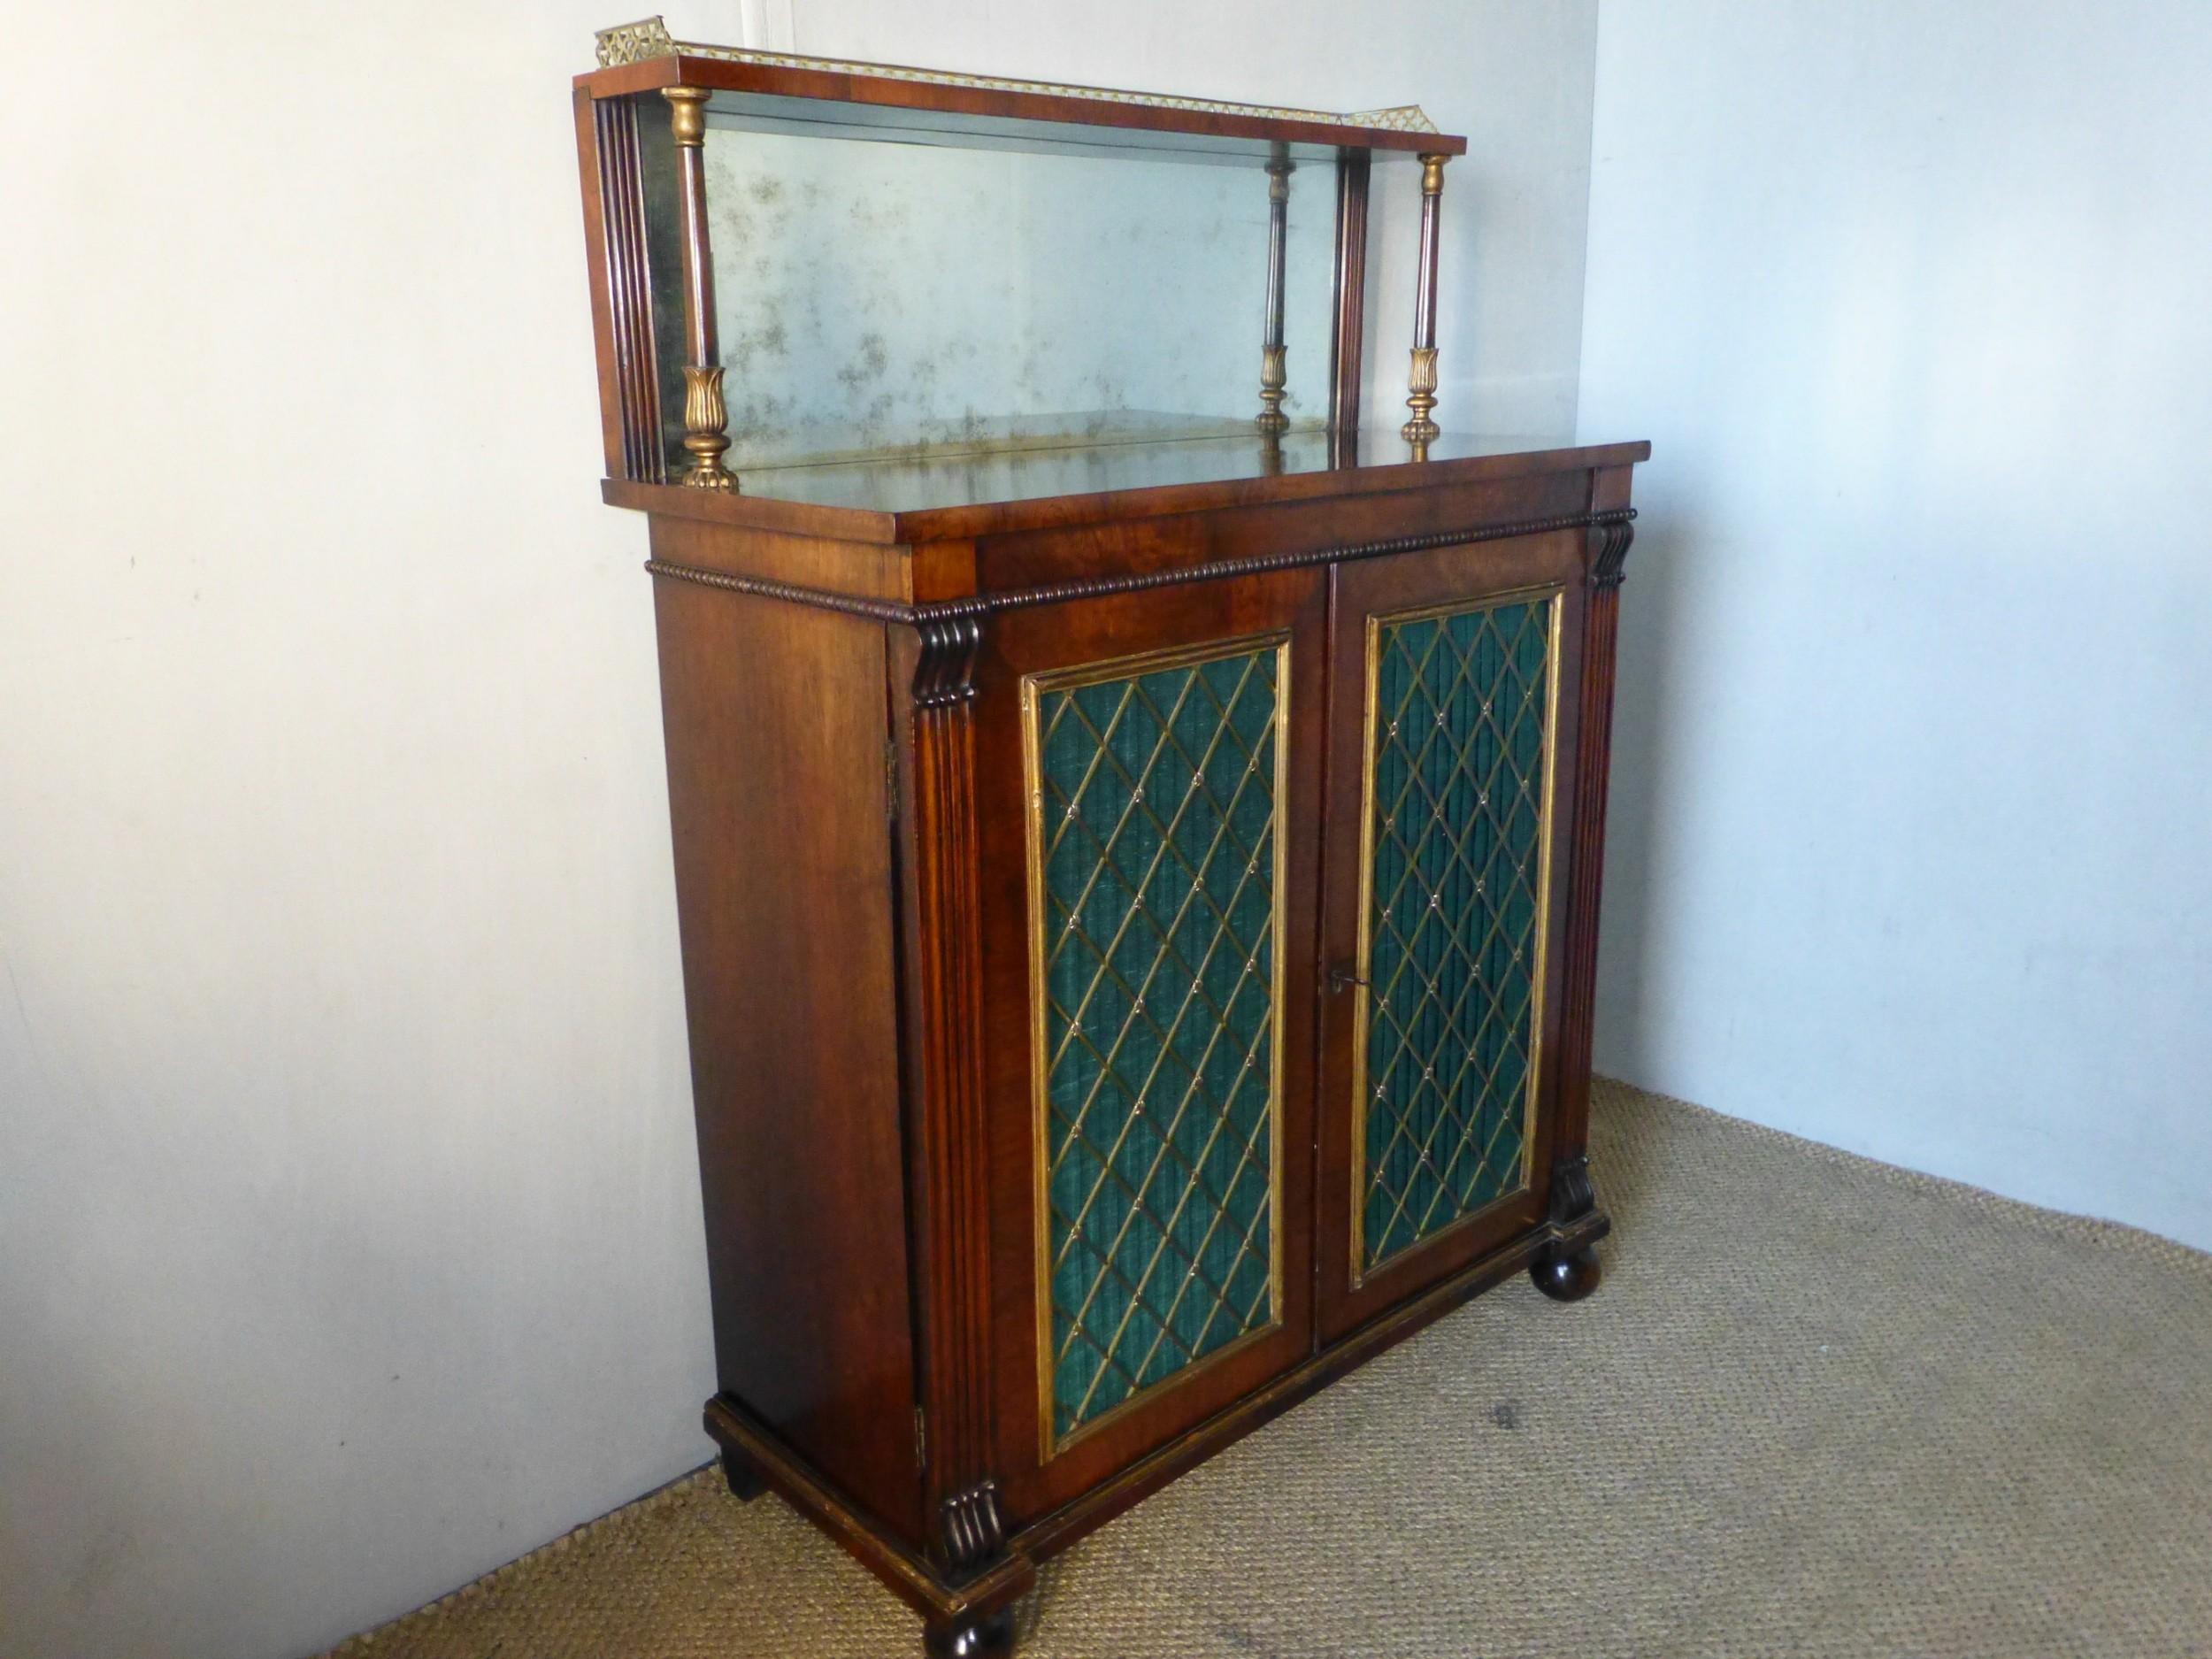 regency gillows rosewood chiffonier sideboard c1825